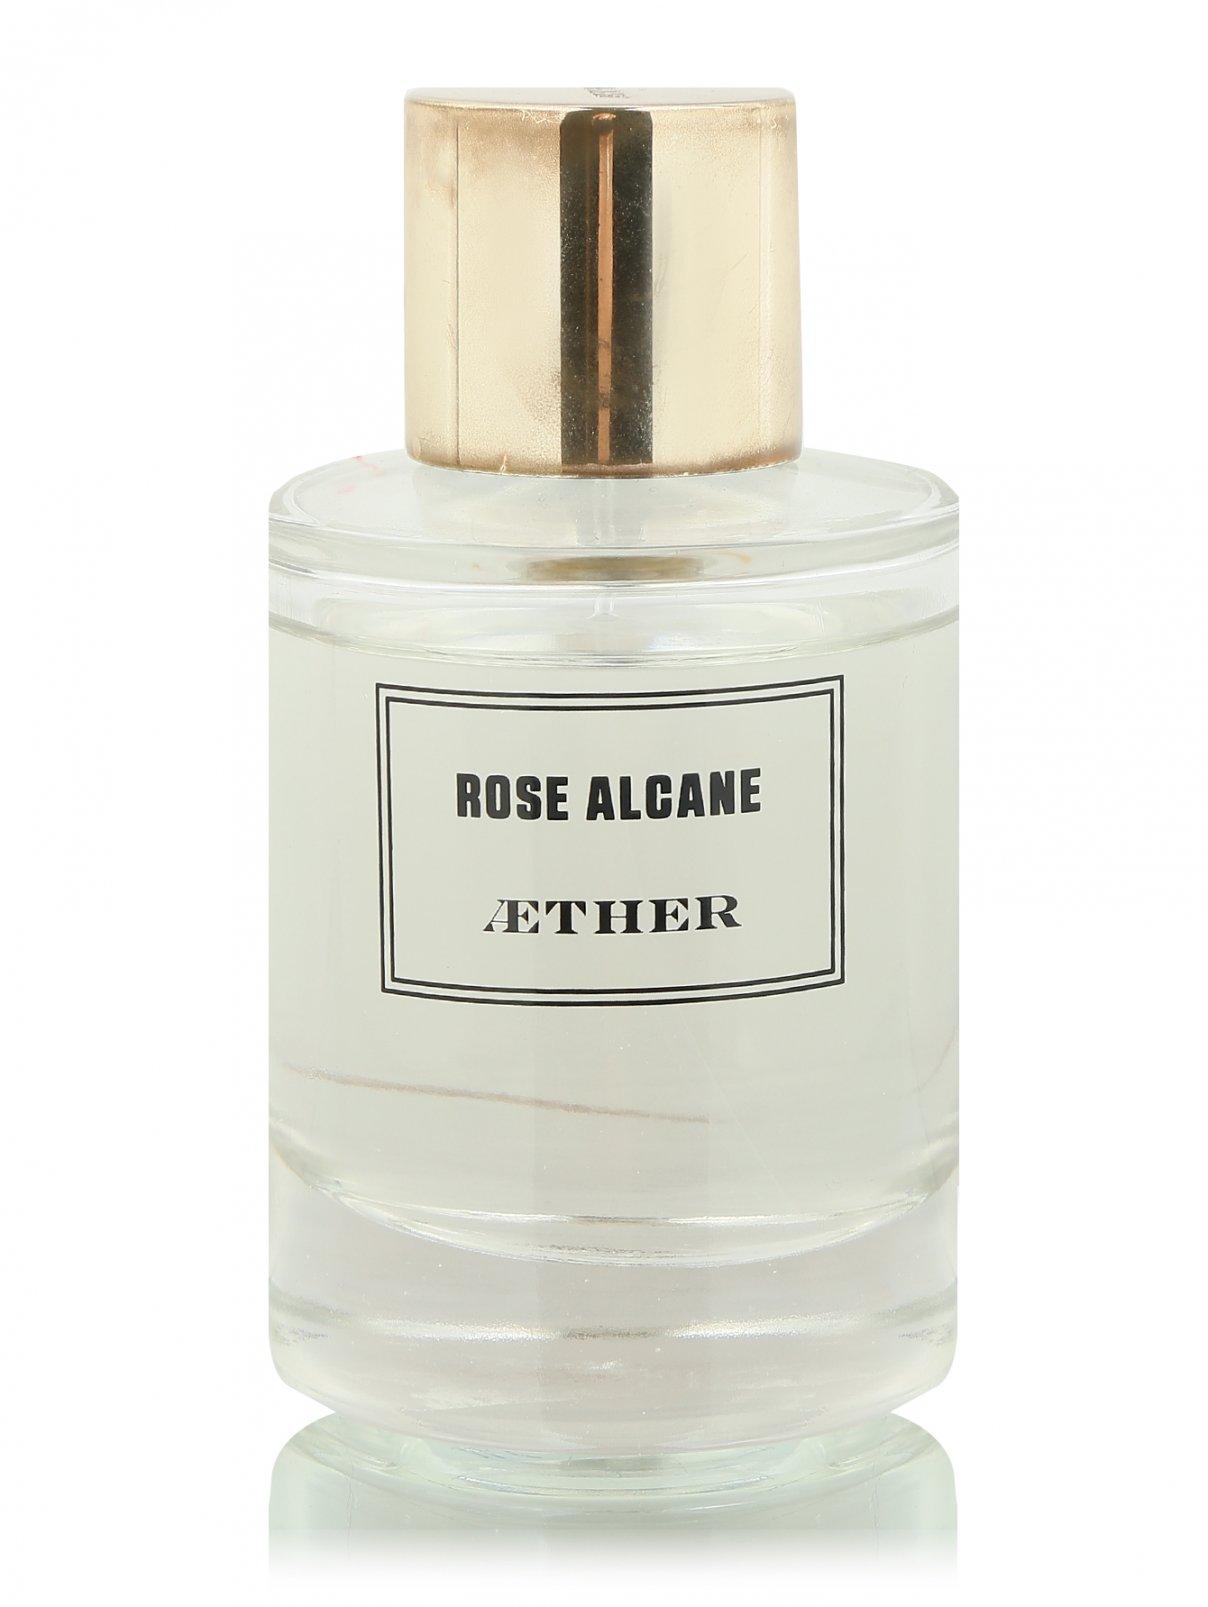 Парфюмерная вода 50 мл Rose Alcane Aether  –  Общий вид